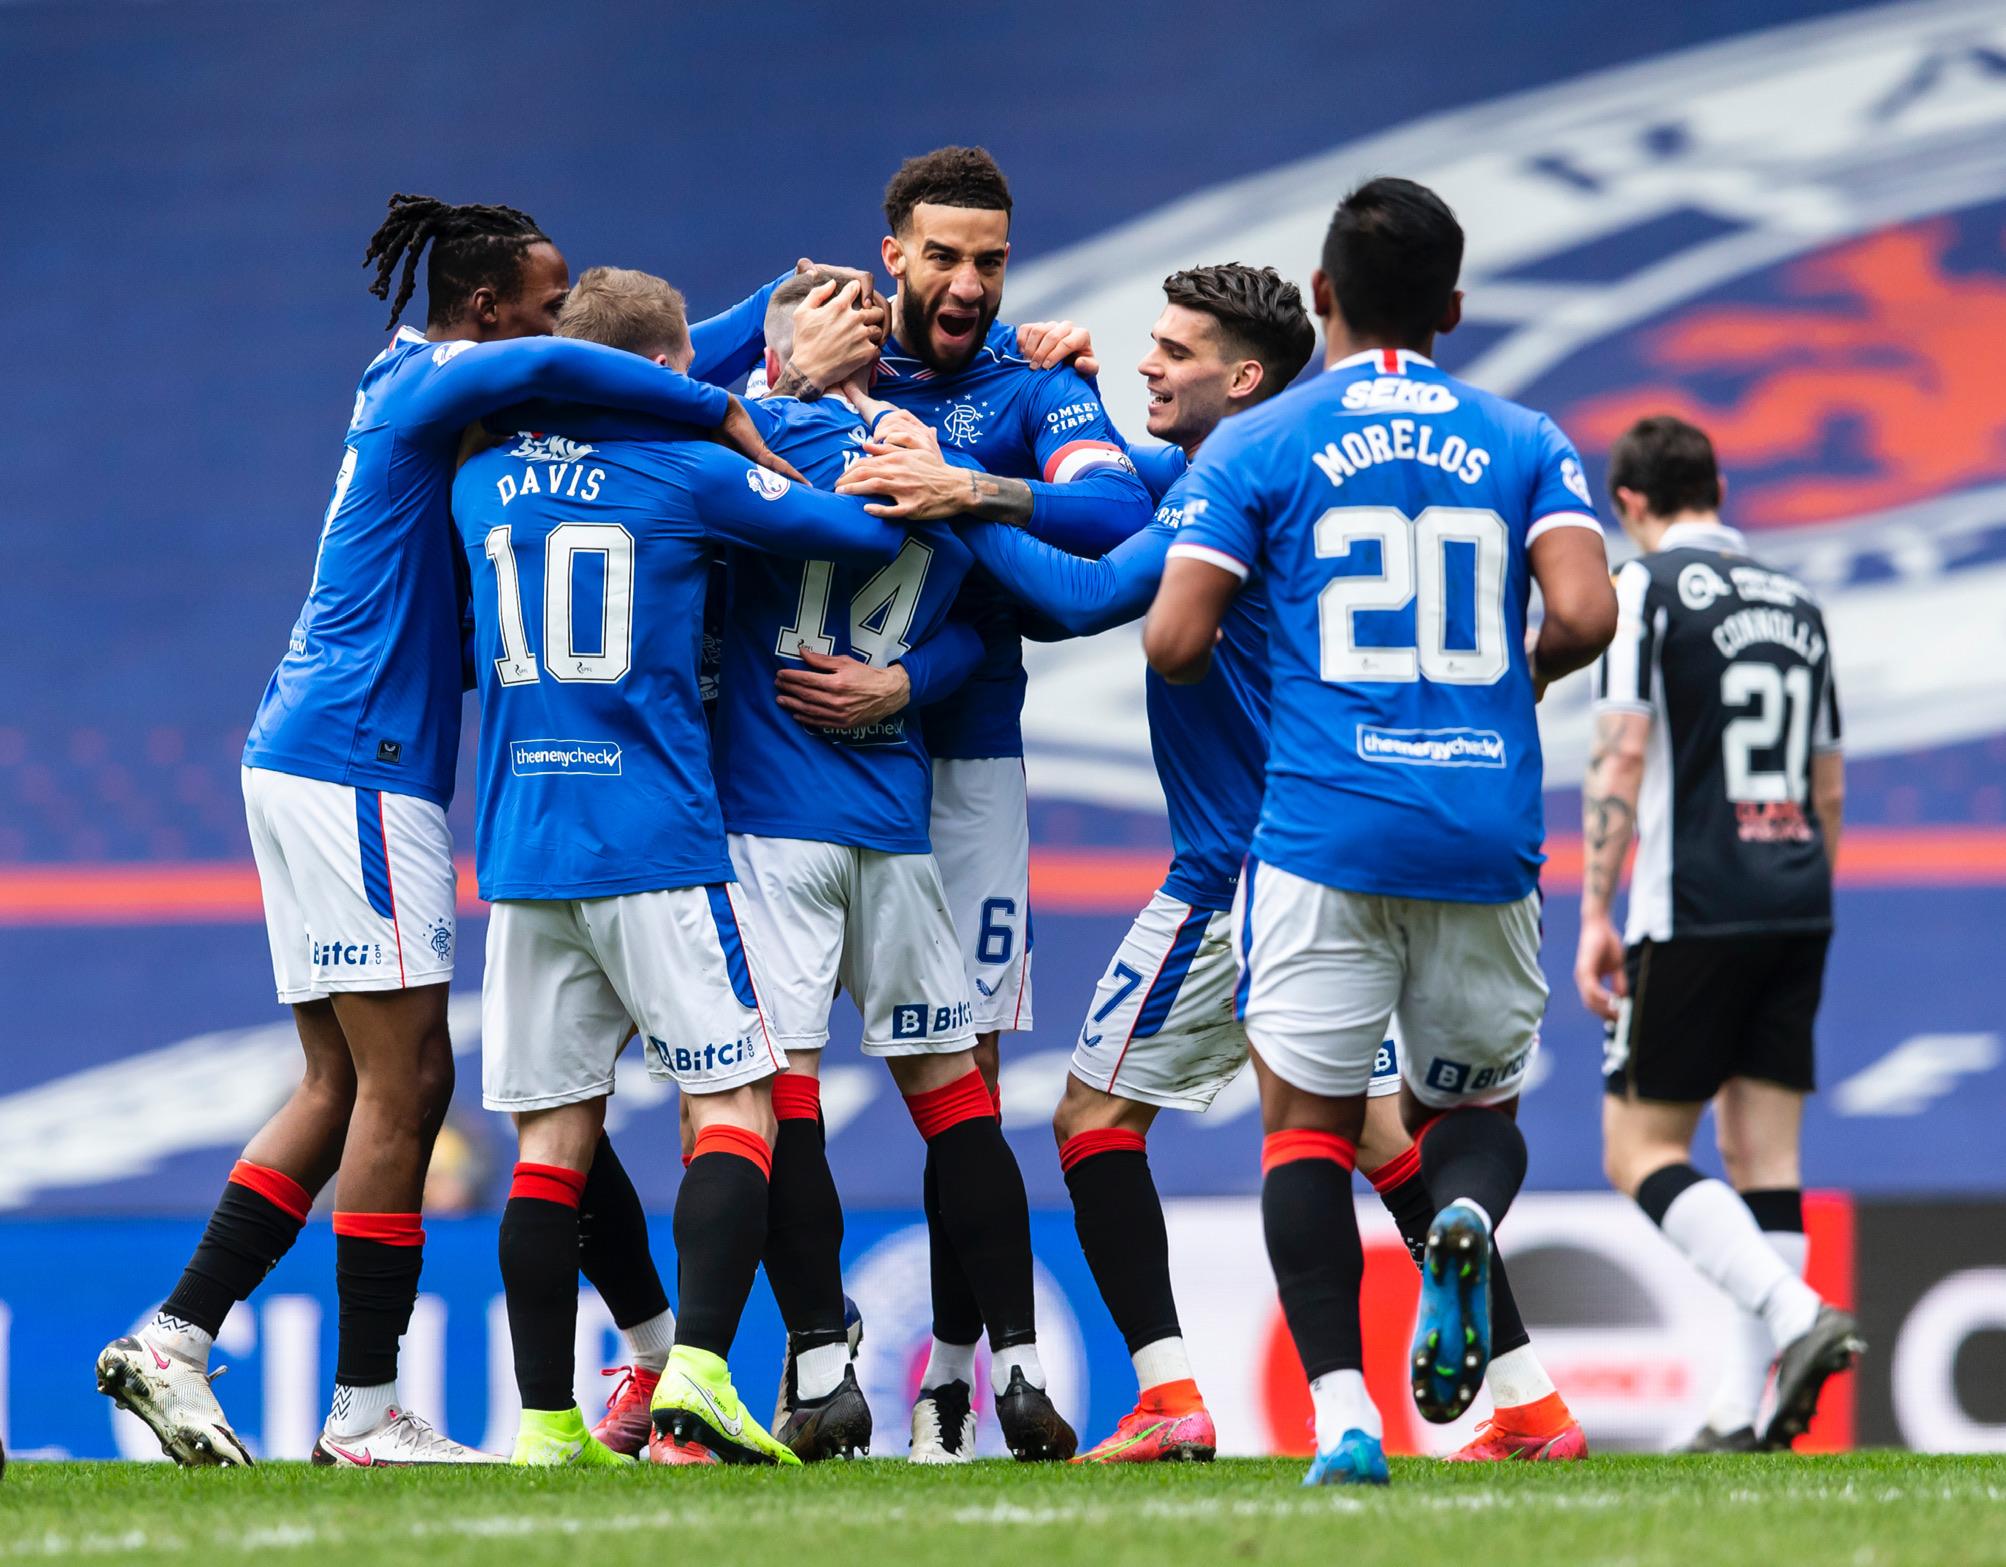 Rangers Scottish Premiership